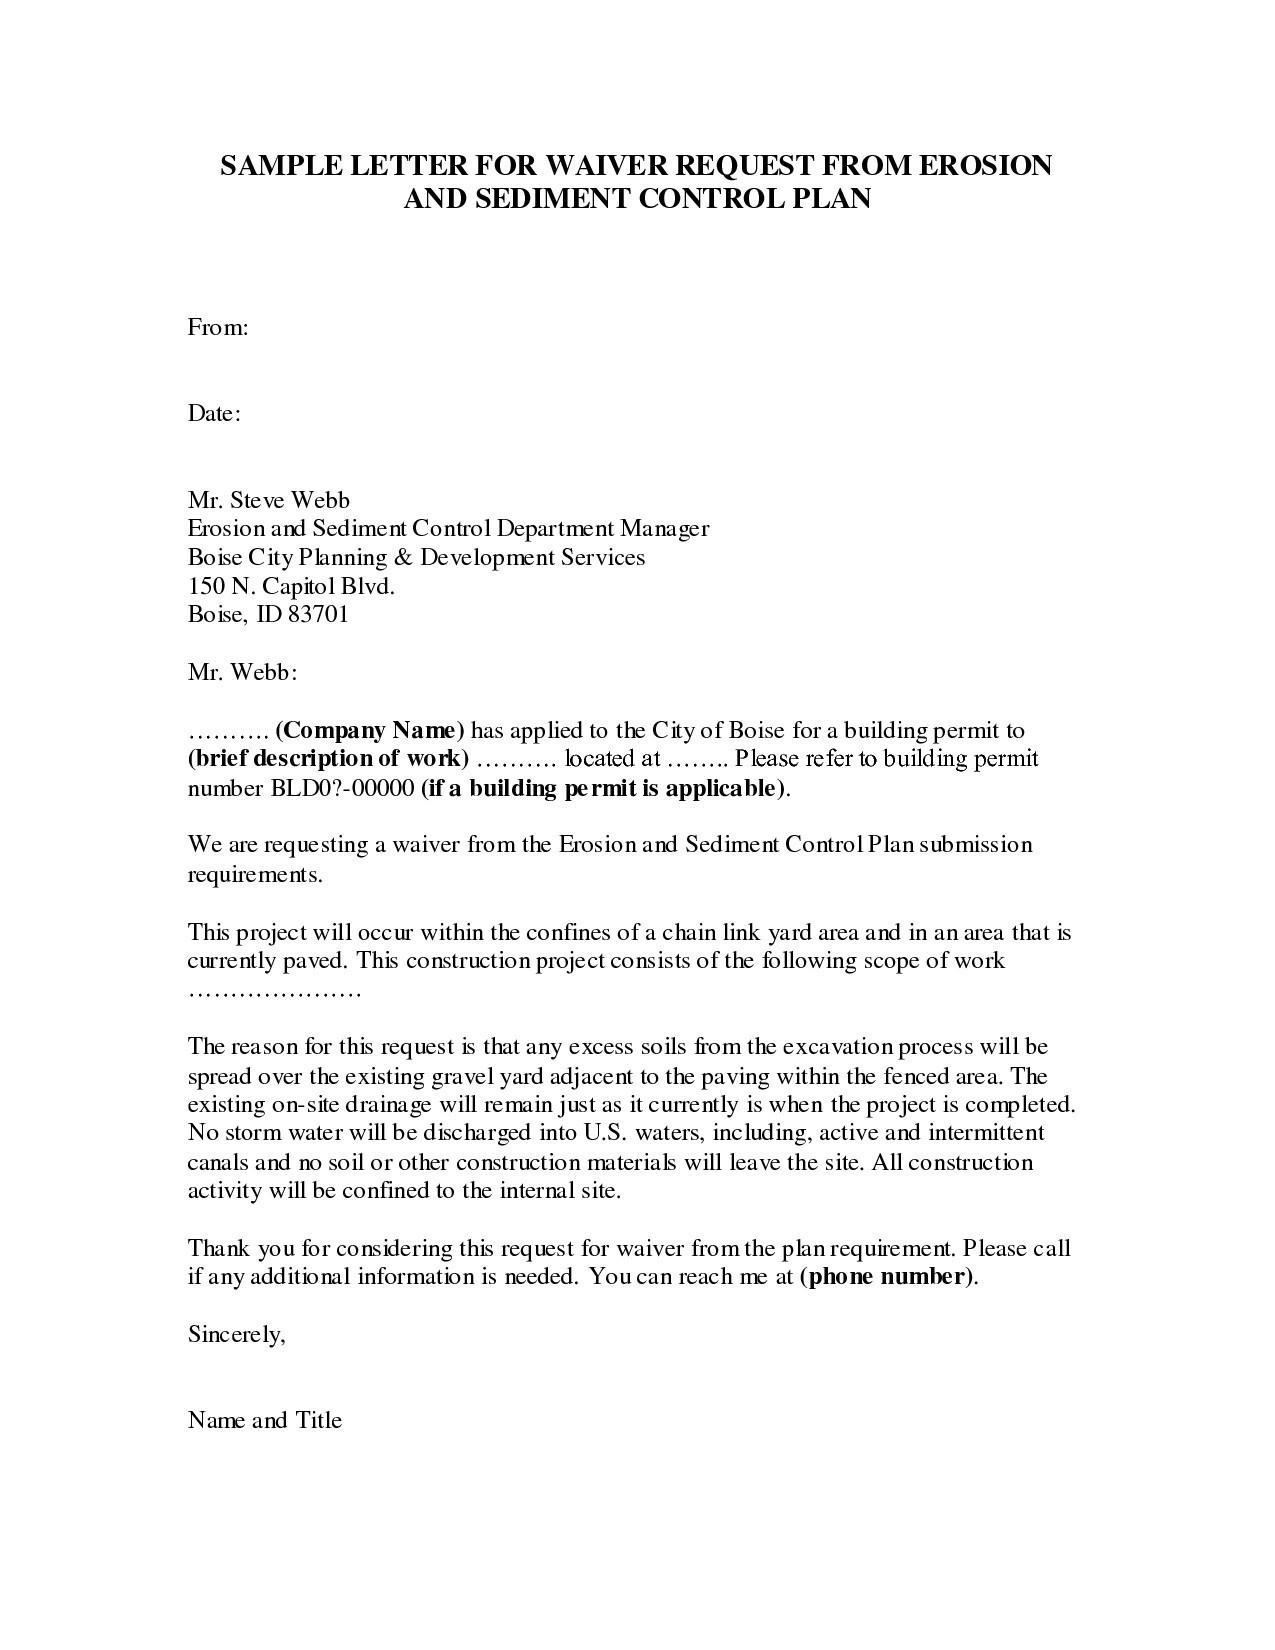 Business Termination Letter Template - Job Letter Template Save Save Sample A Job Termination Letter Biz